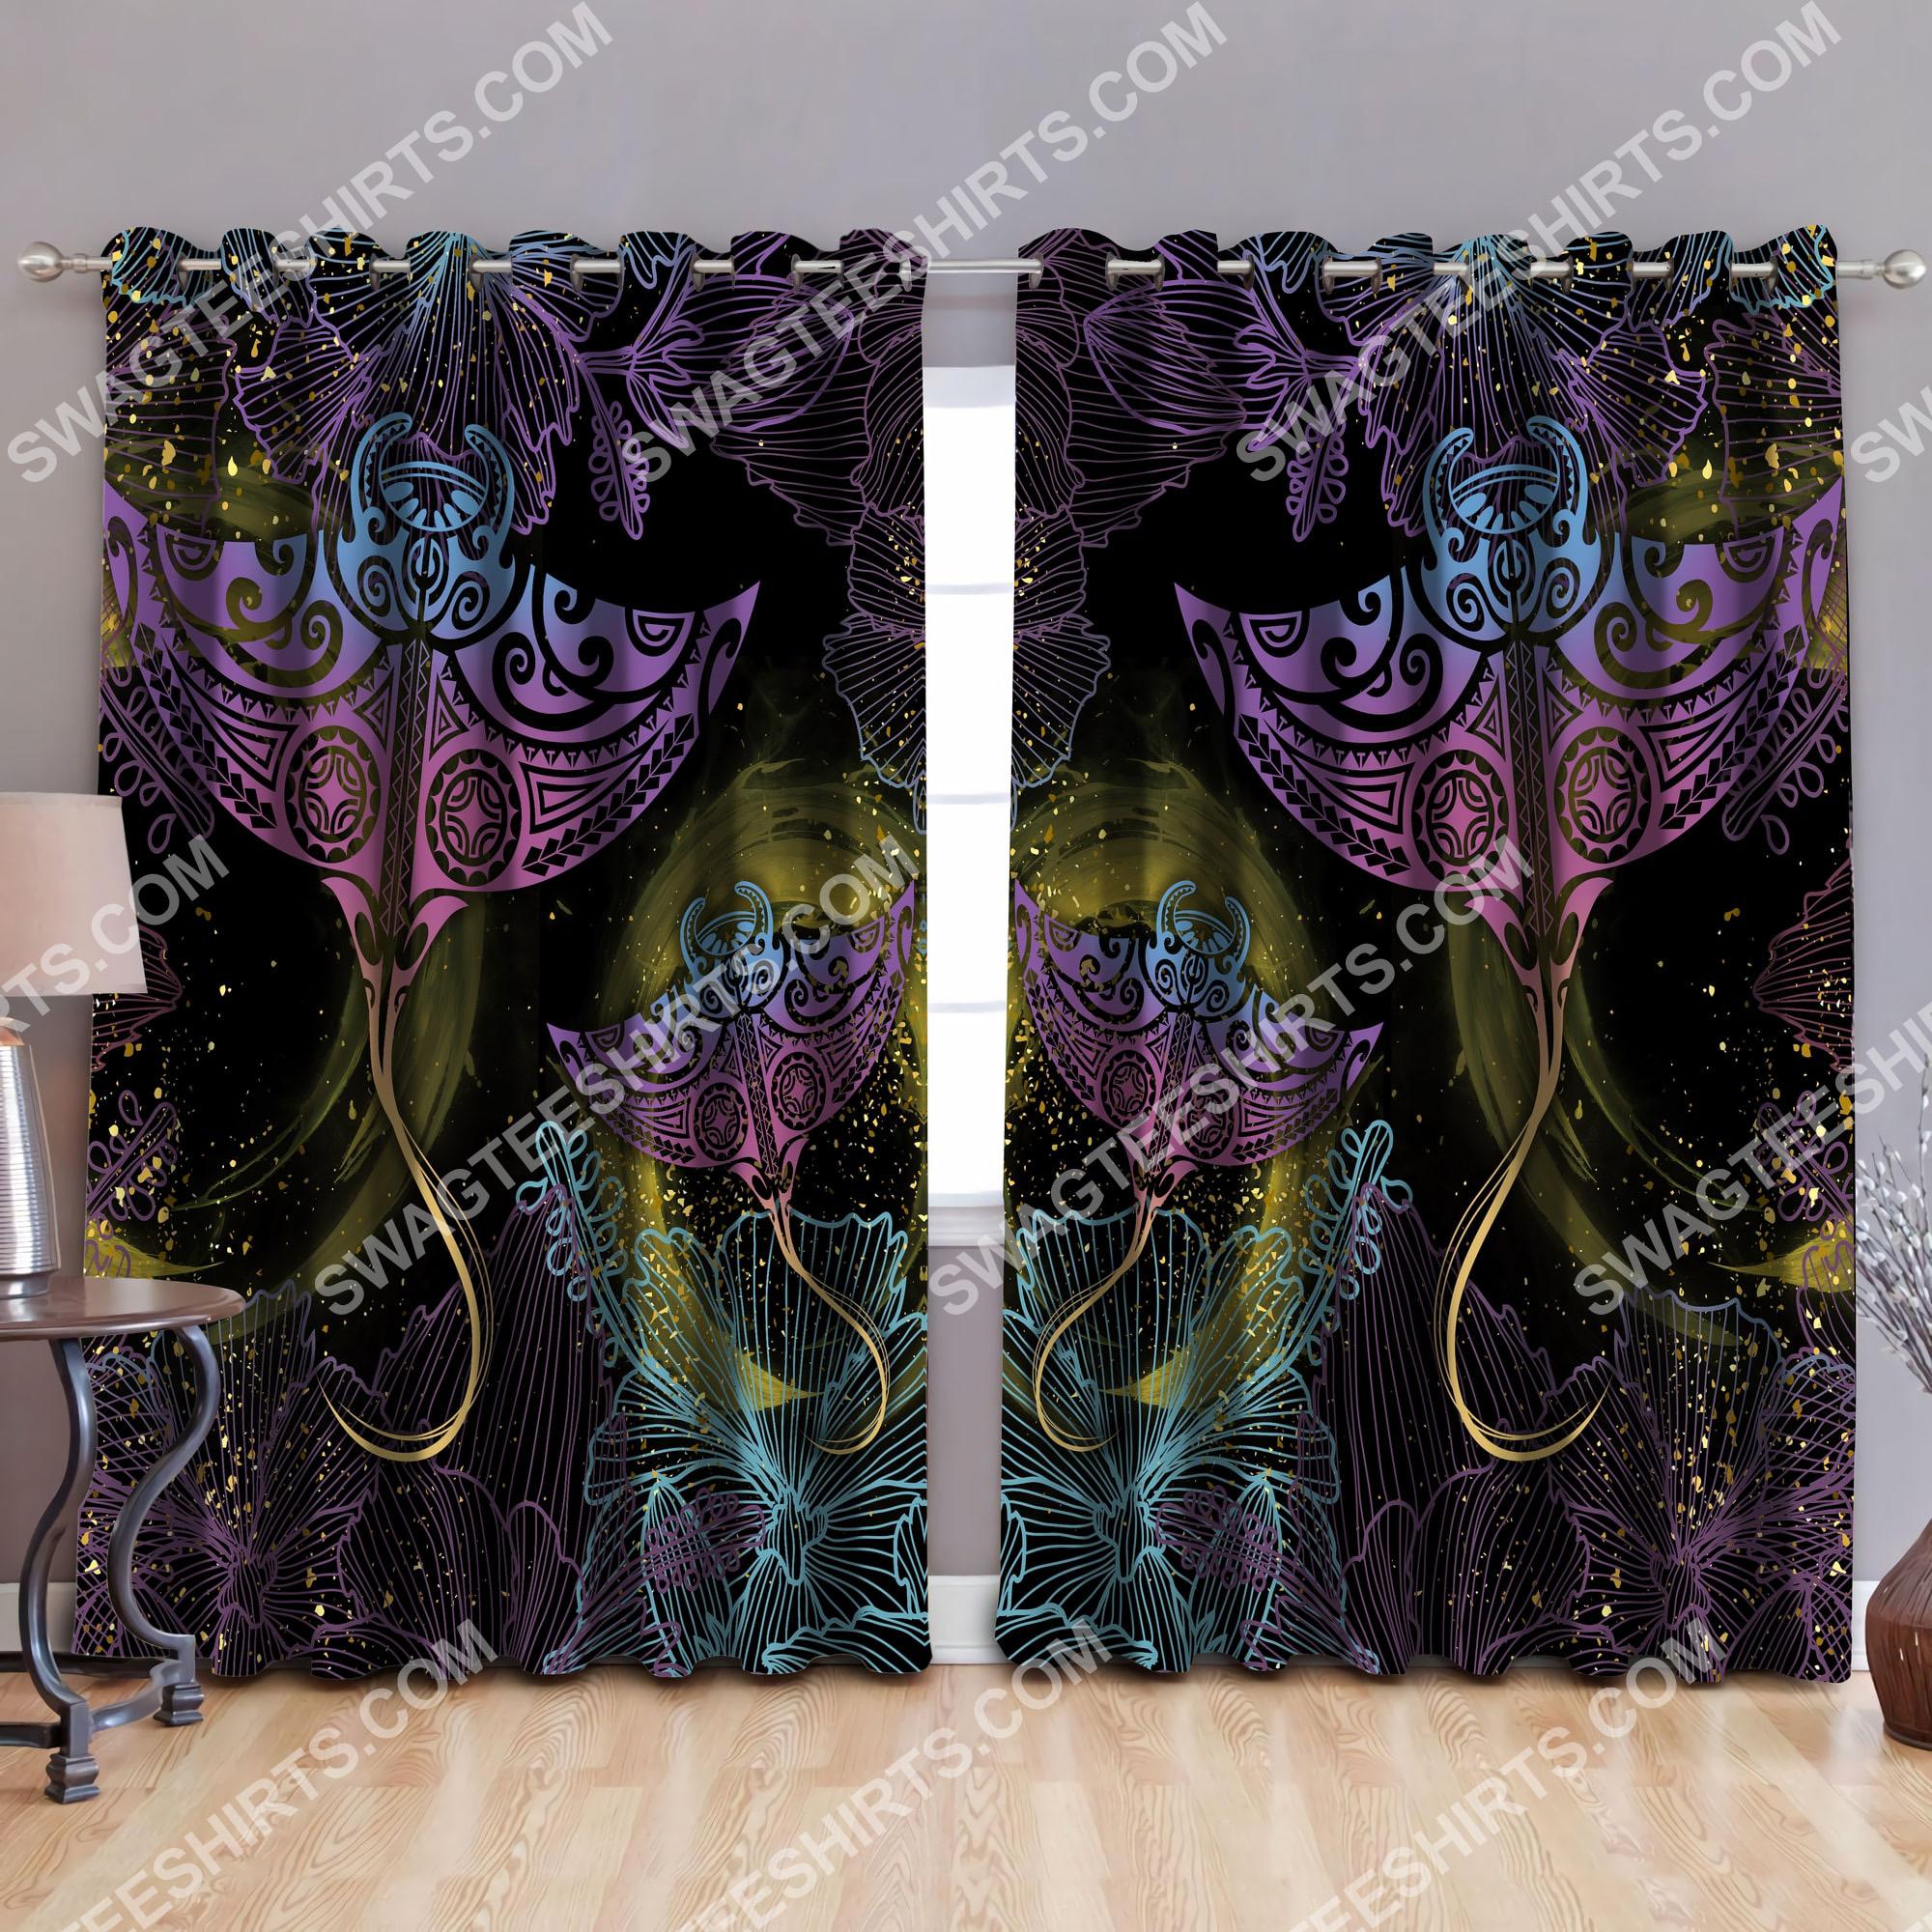 polynesian beautiful ray galaxy all over printed window curtains 2(2) - Copy